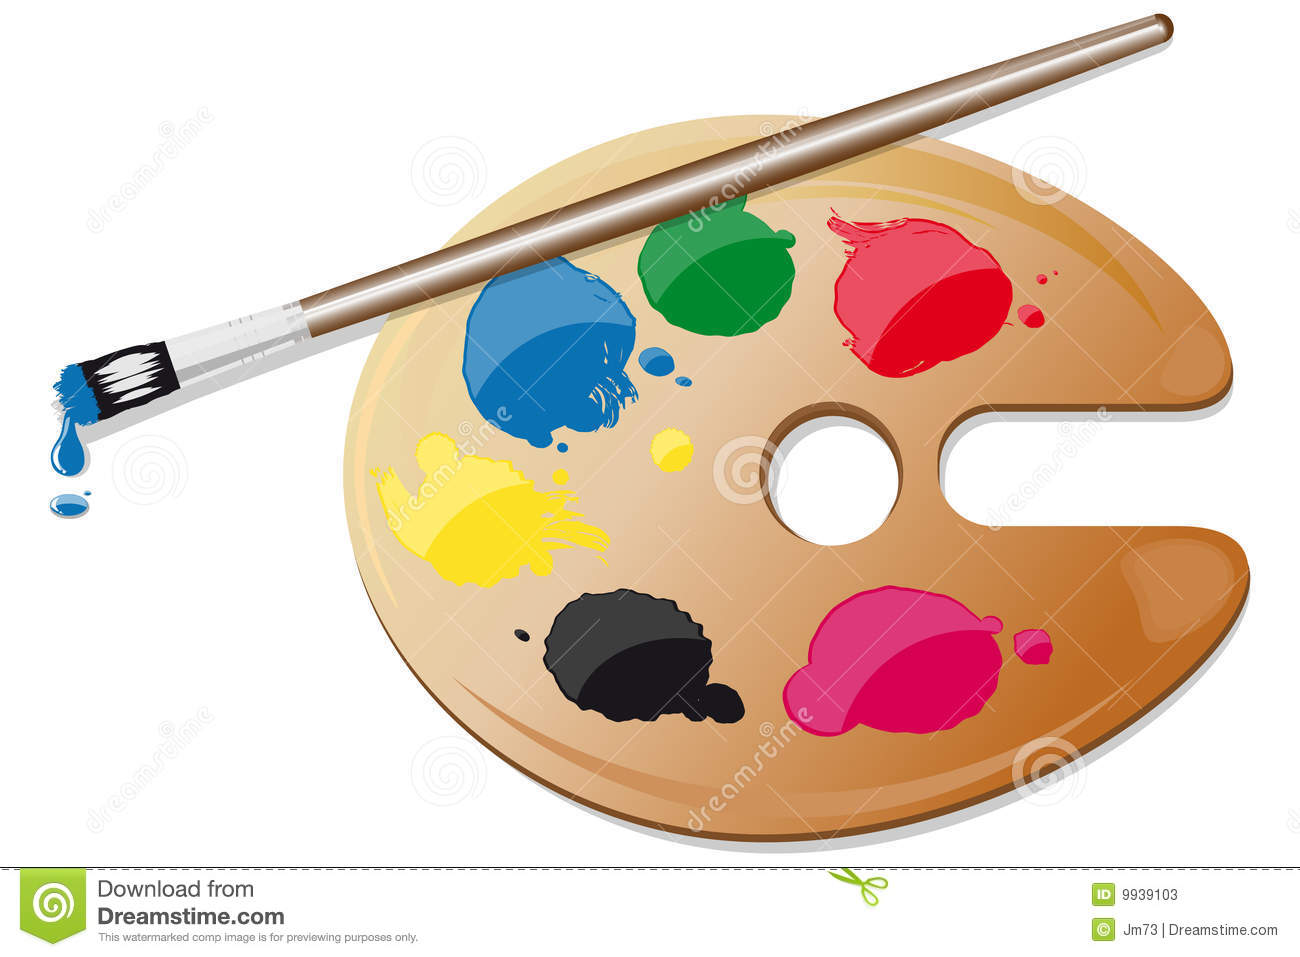 Pinsel und farbe clipart png freeuse Malerpalette Mit Farben Und Pinsel Stockfotos - Bild: 9939103 png freeuse